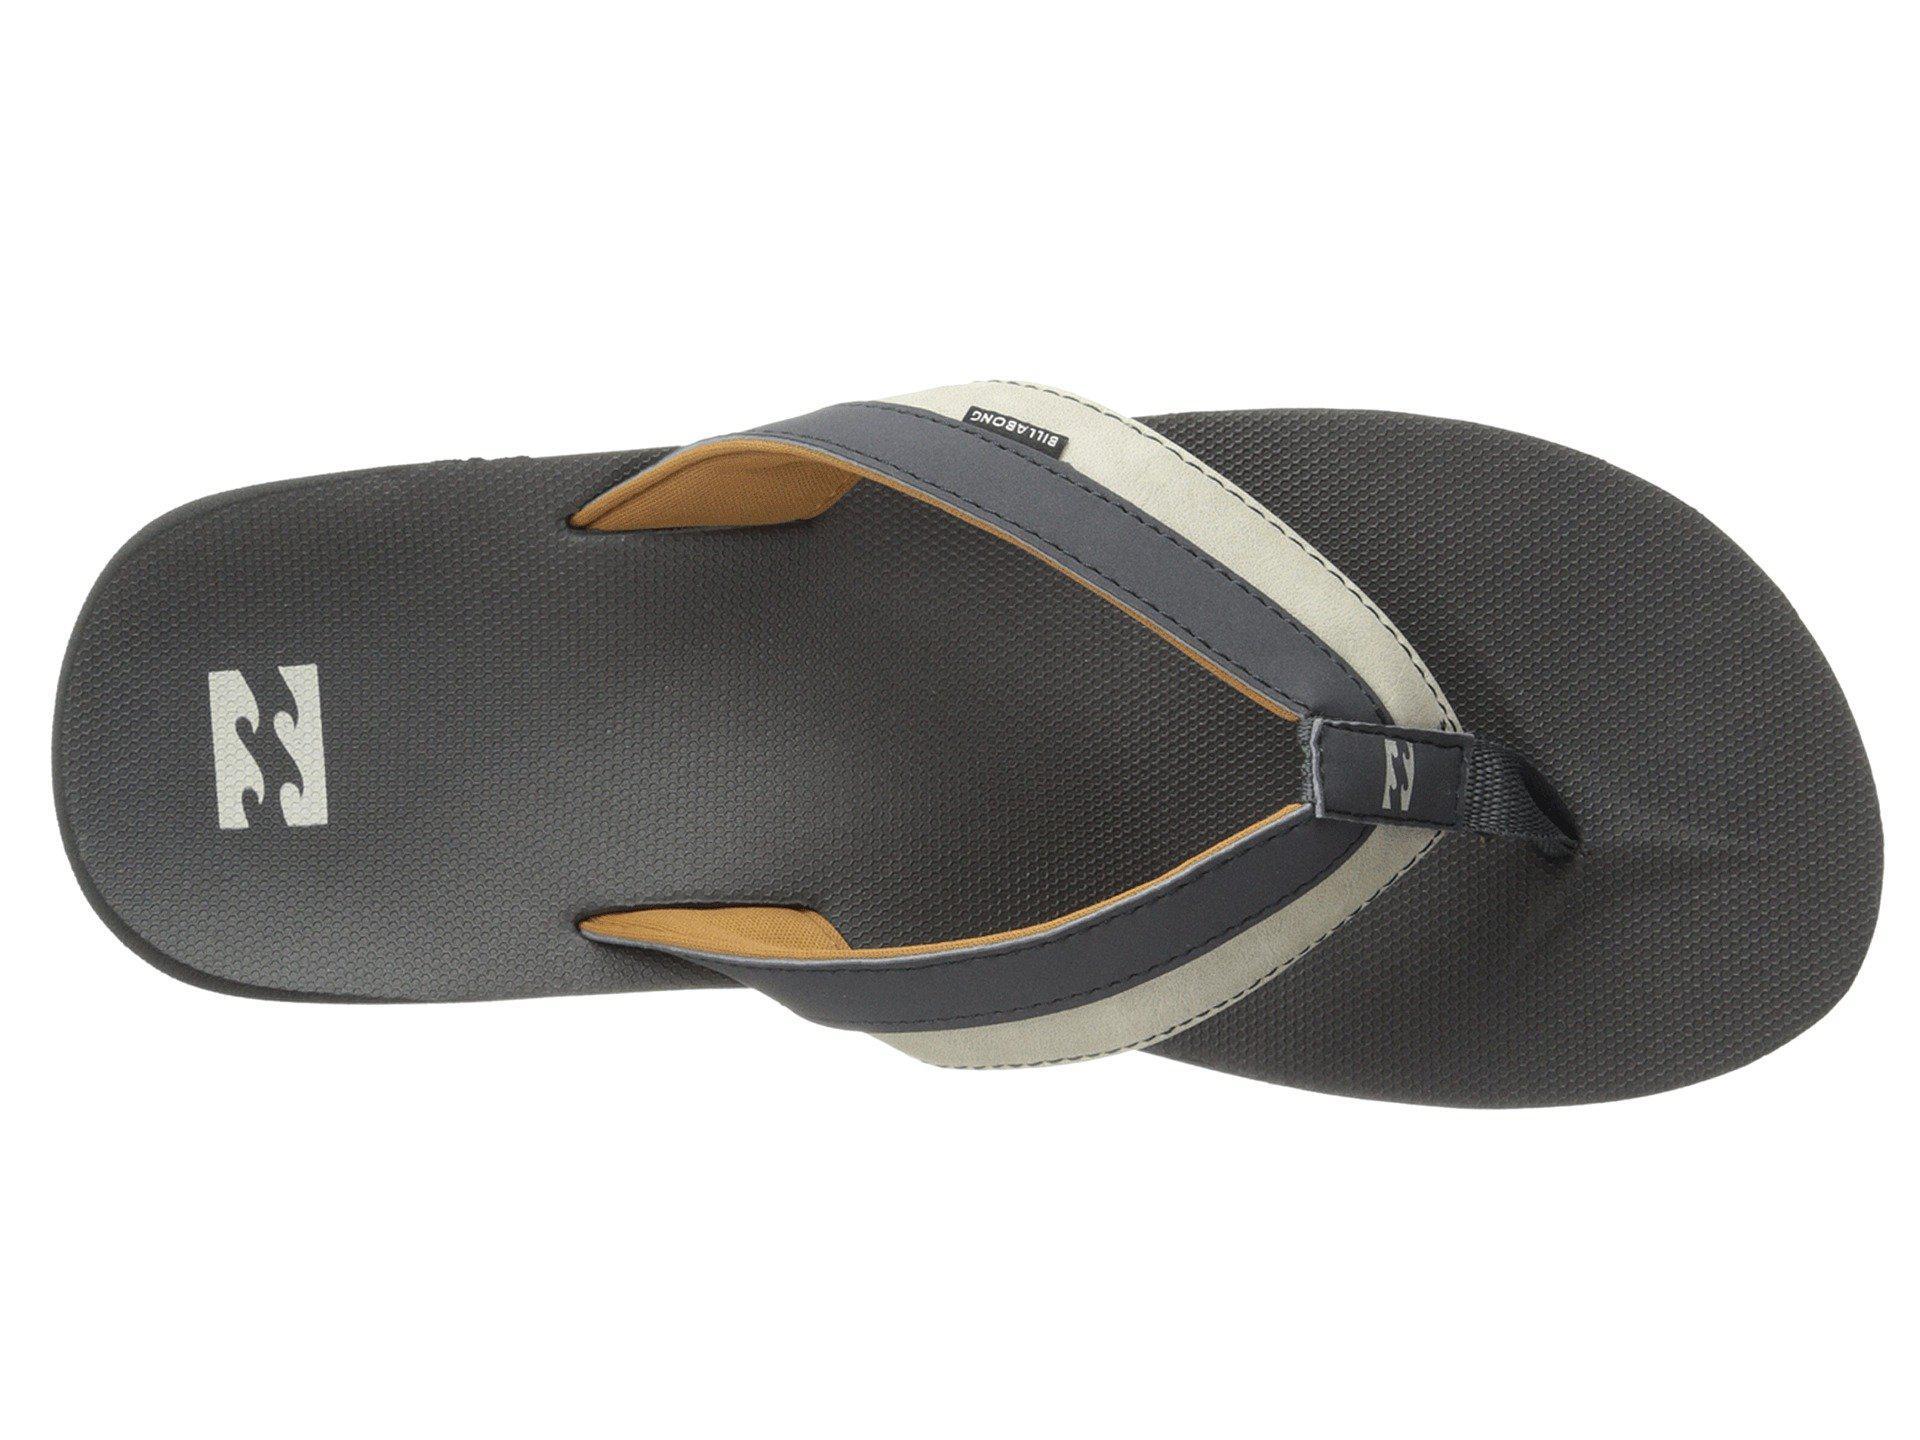 92946a0fb Billabong - Gray All Day Impact Sandal (black) Men s Sandals for Men -  Lyst. View fullscreen